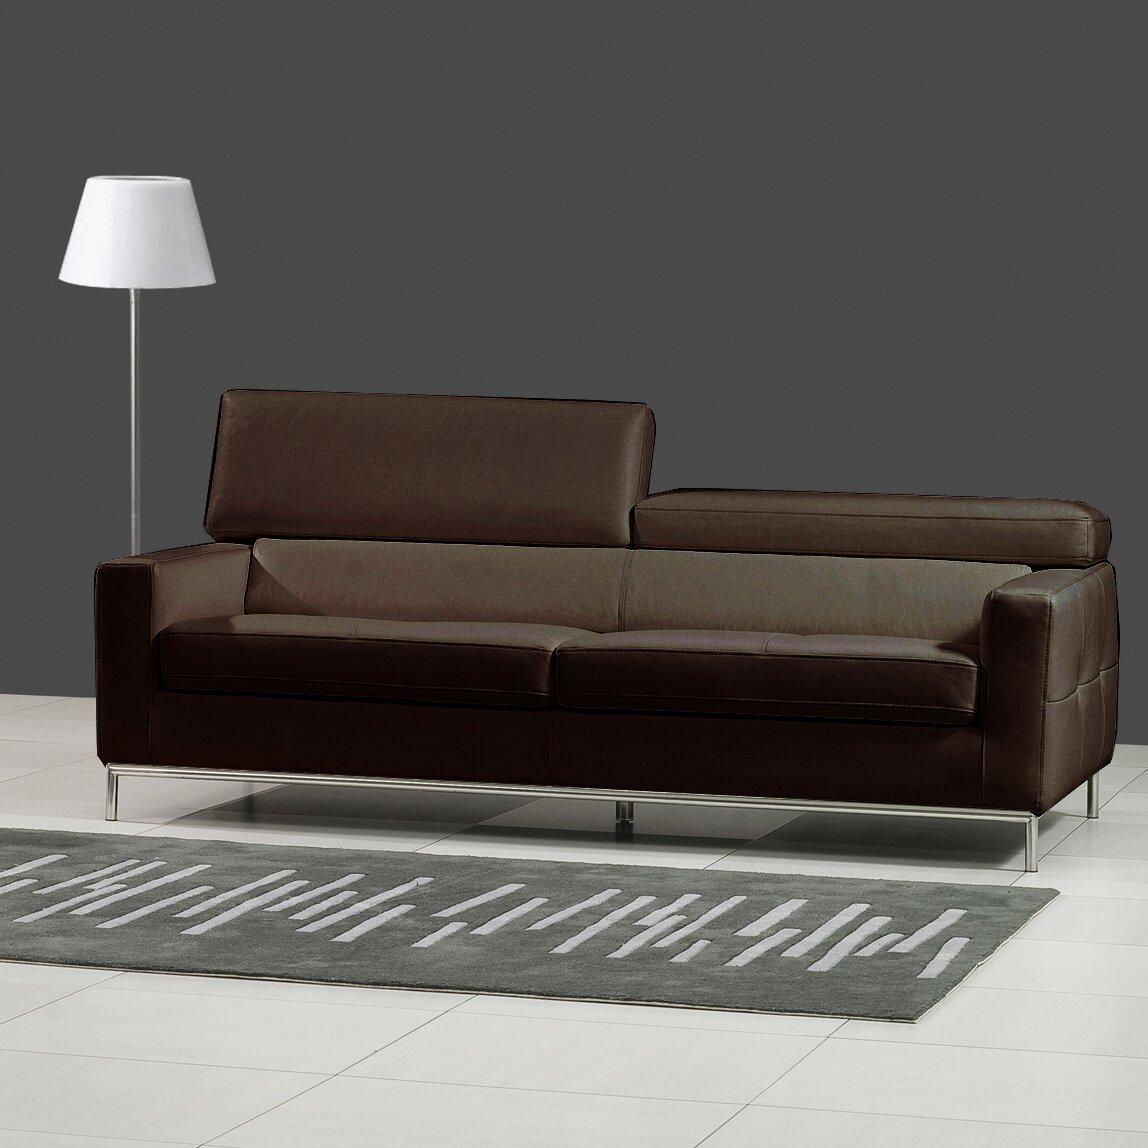 bellini modern living - bellini modern living furniture universnarutocom